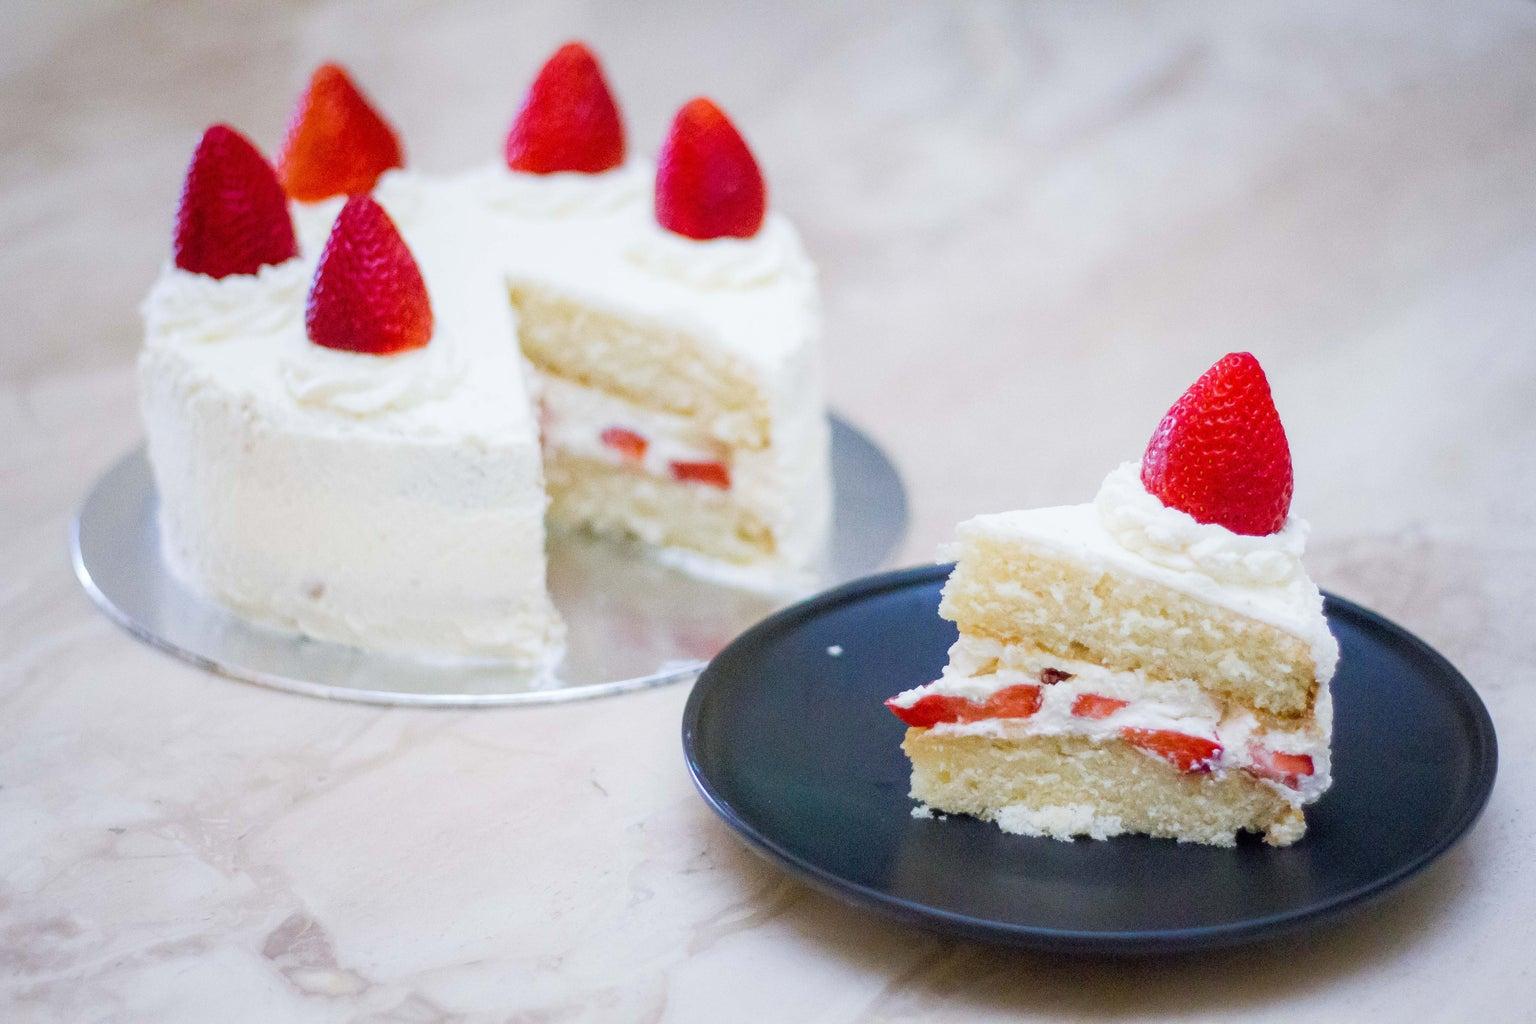 ENJOY YOUR CAKE!!!